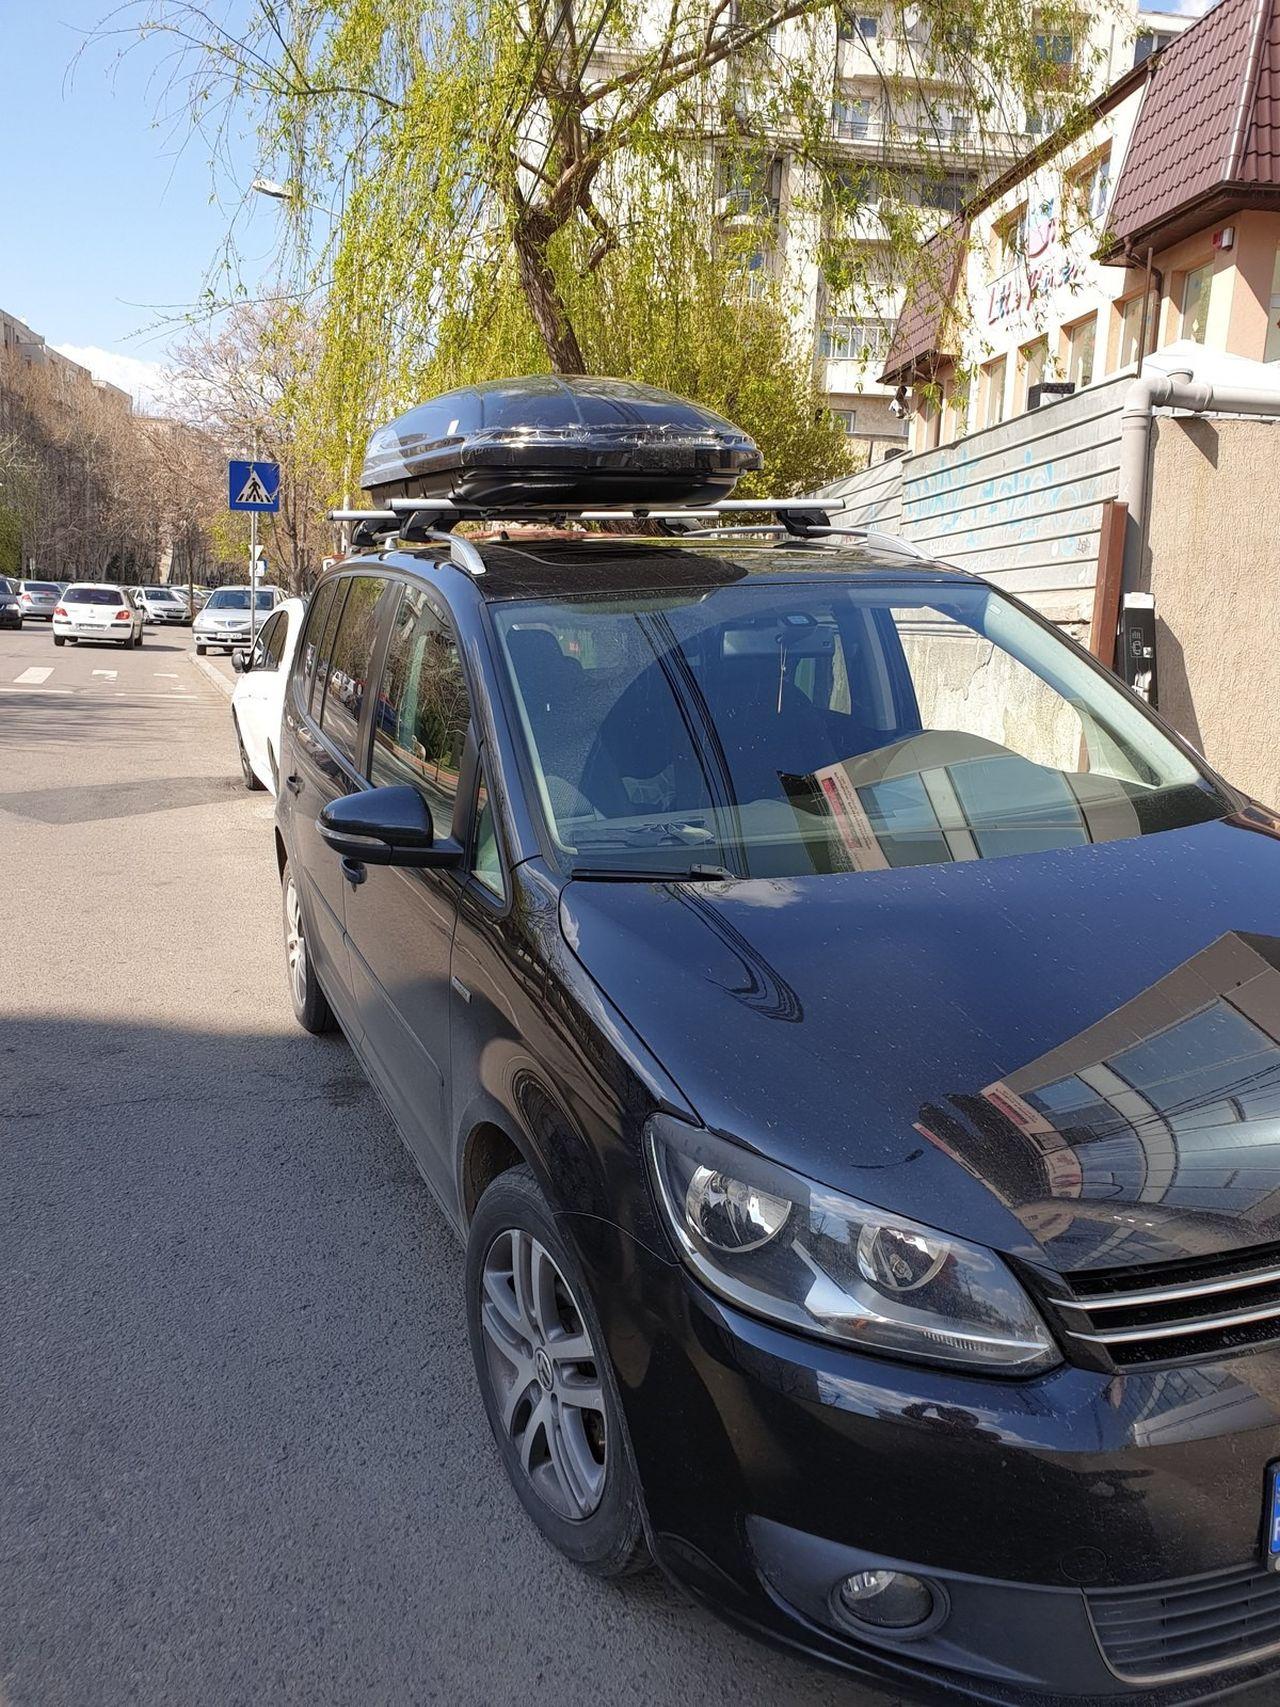 Volkswagen Touran bare transversale Menabo Sherman XL si cutie portbagaj Menabo Mania